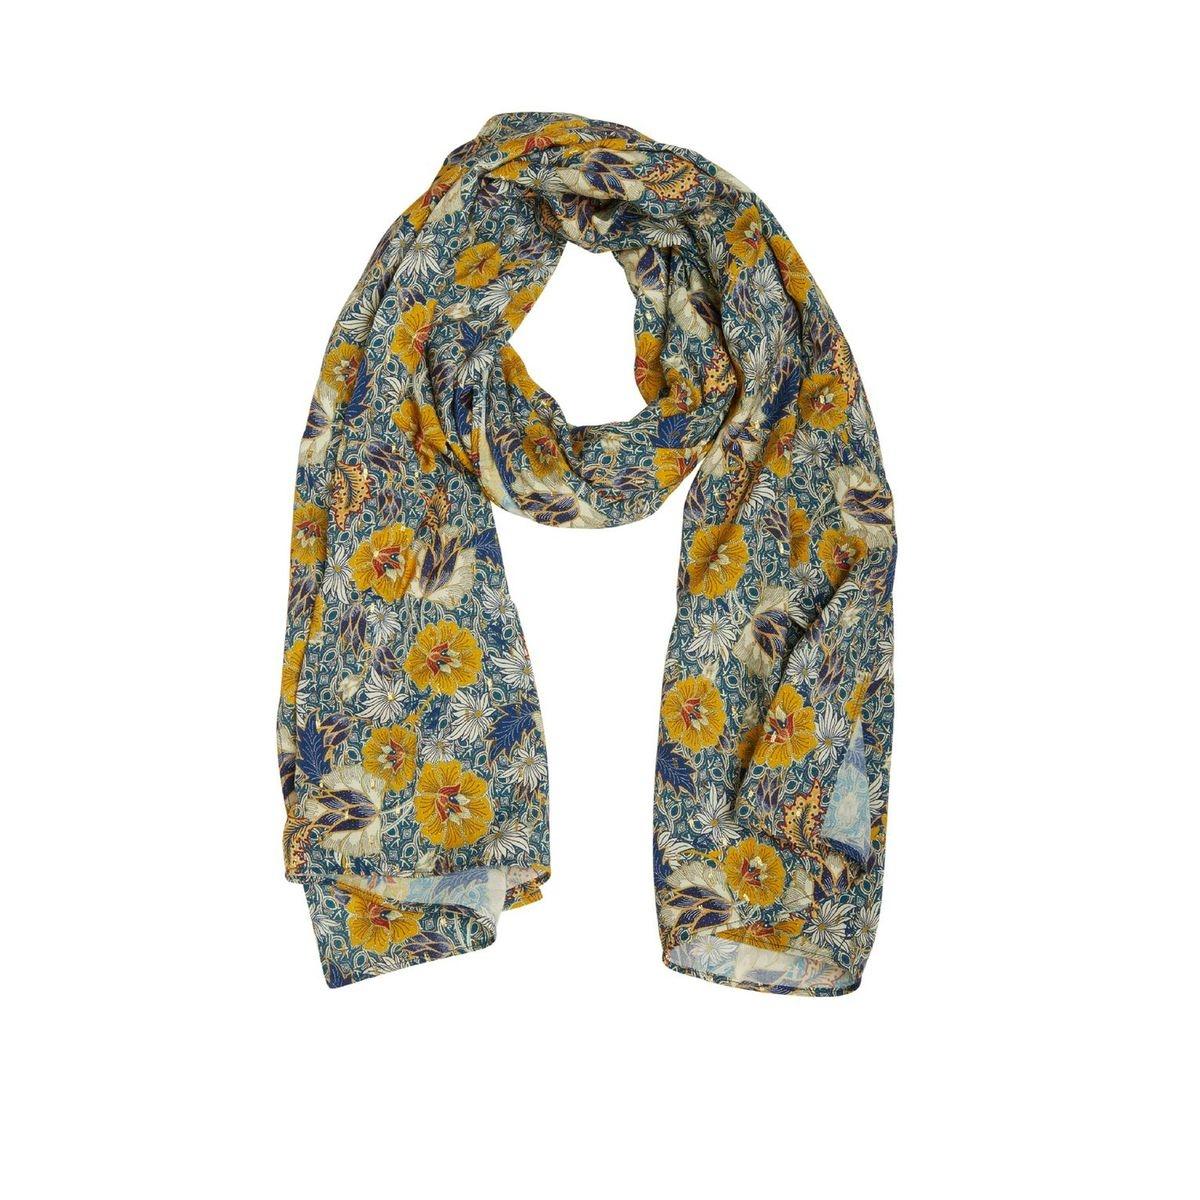 Foulard motif floral